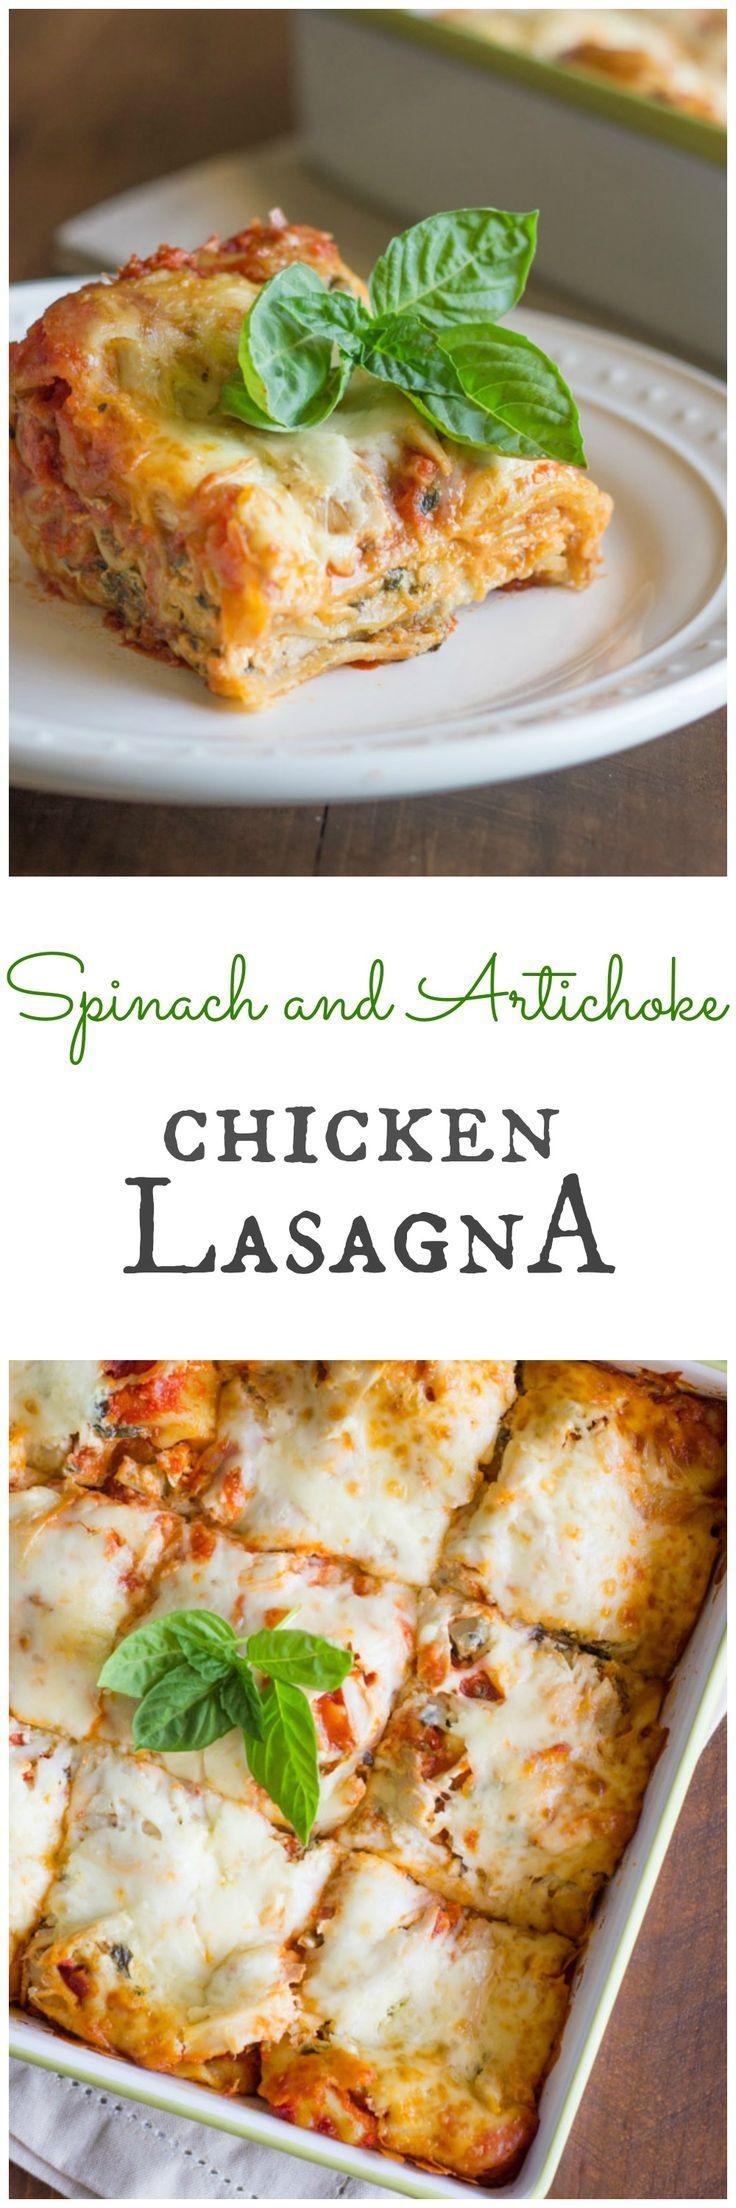 Spinach and Artichoke Chicken Lasagna with three easy shortcuts!